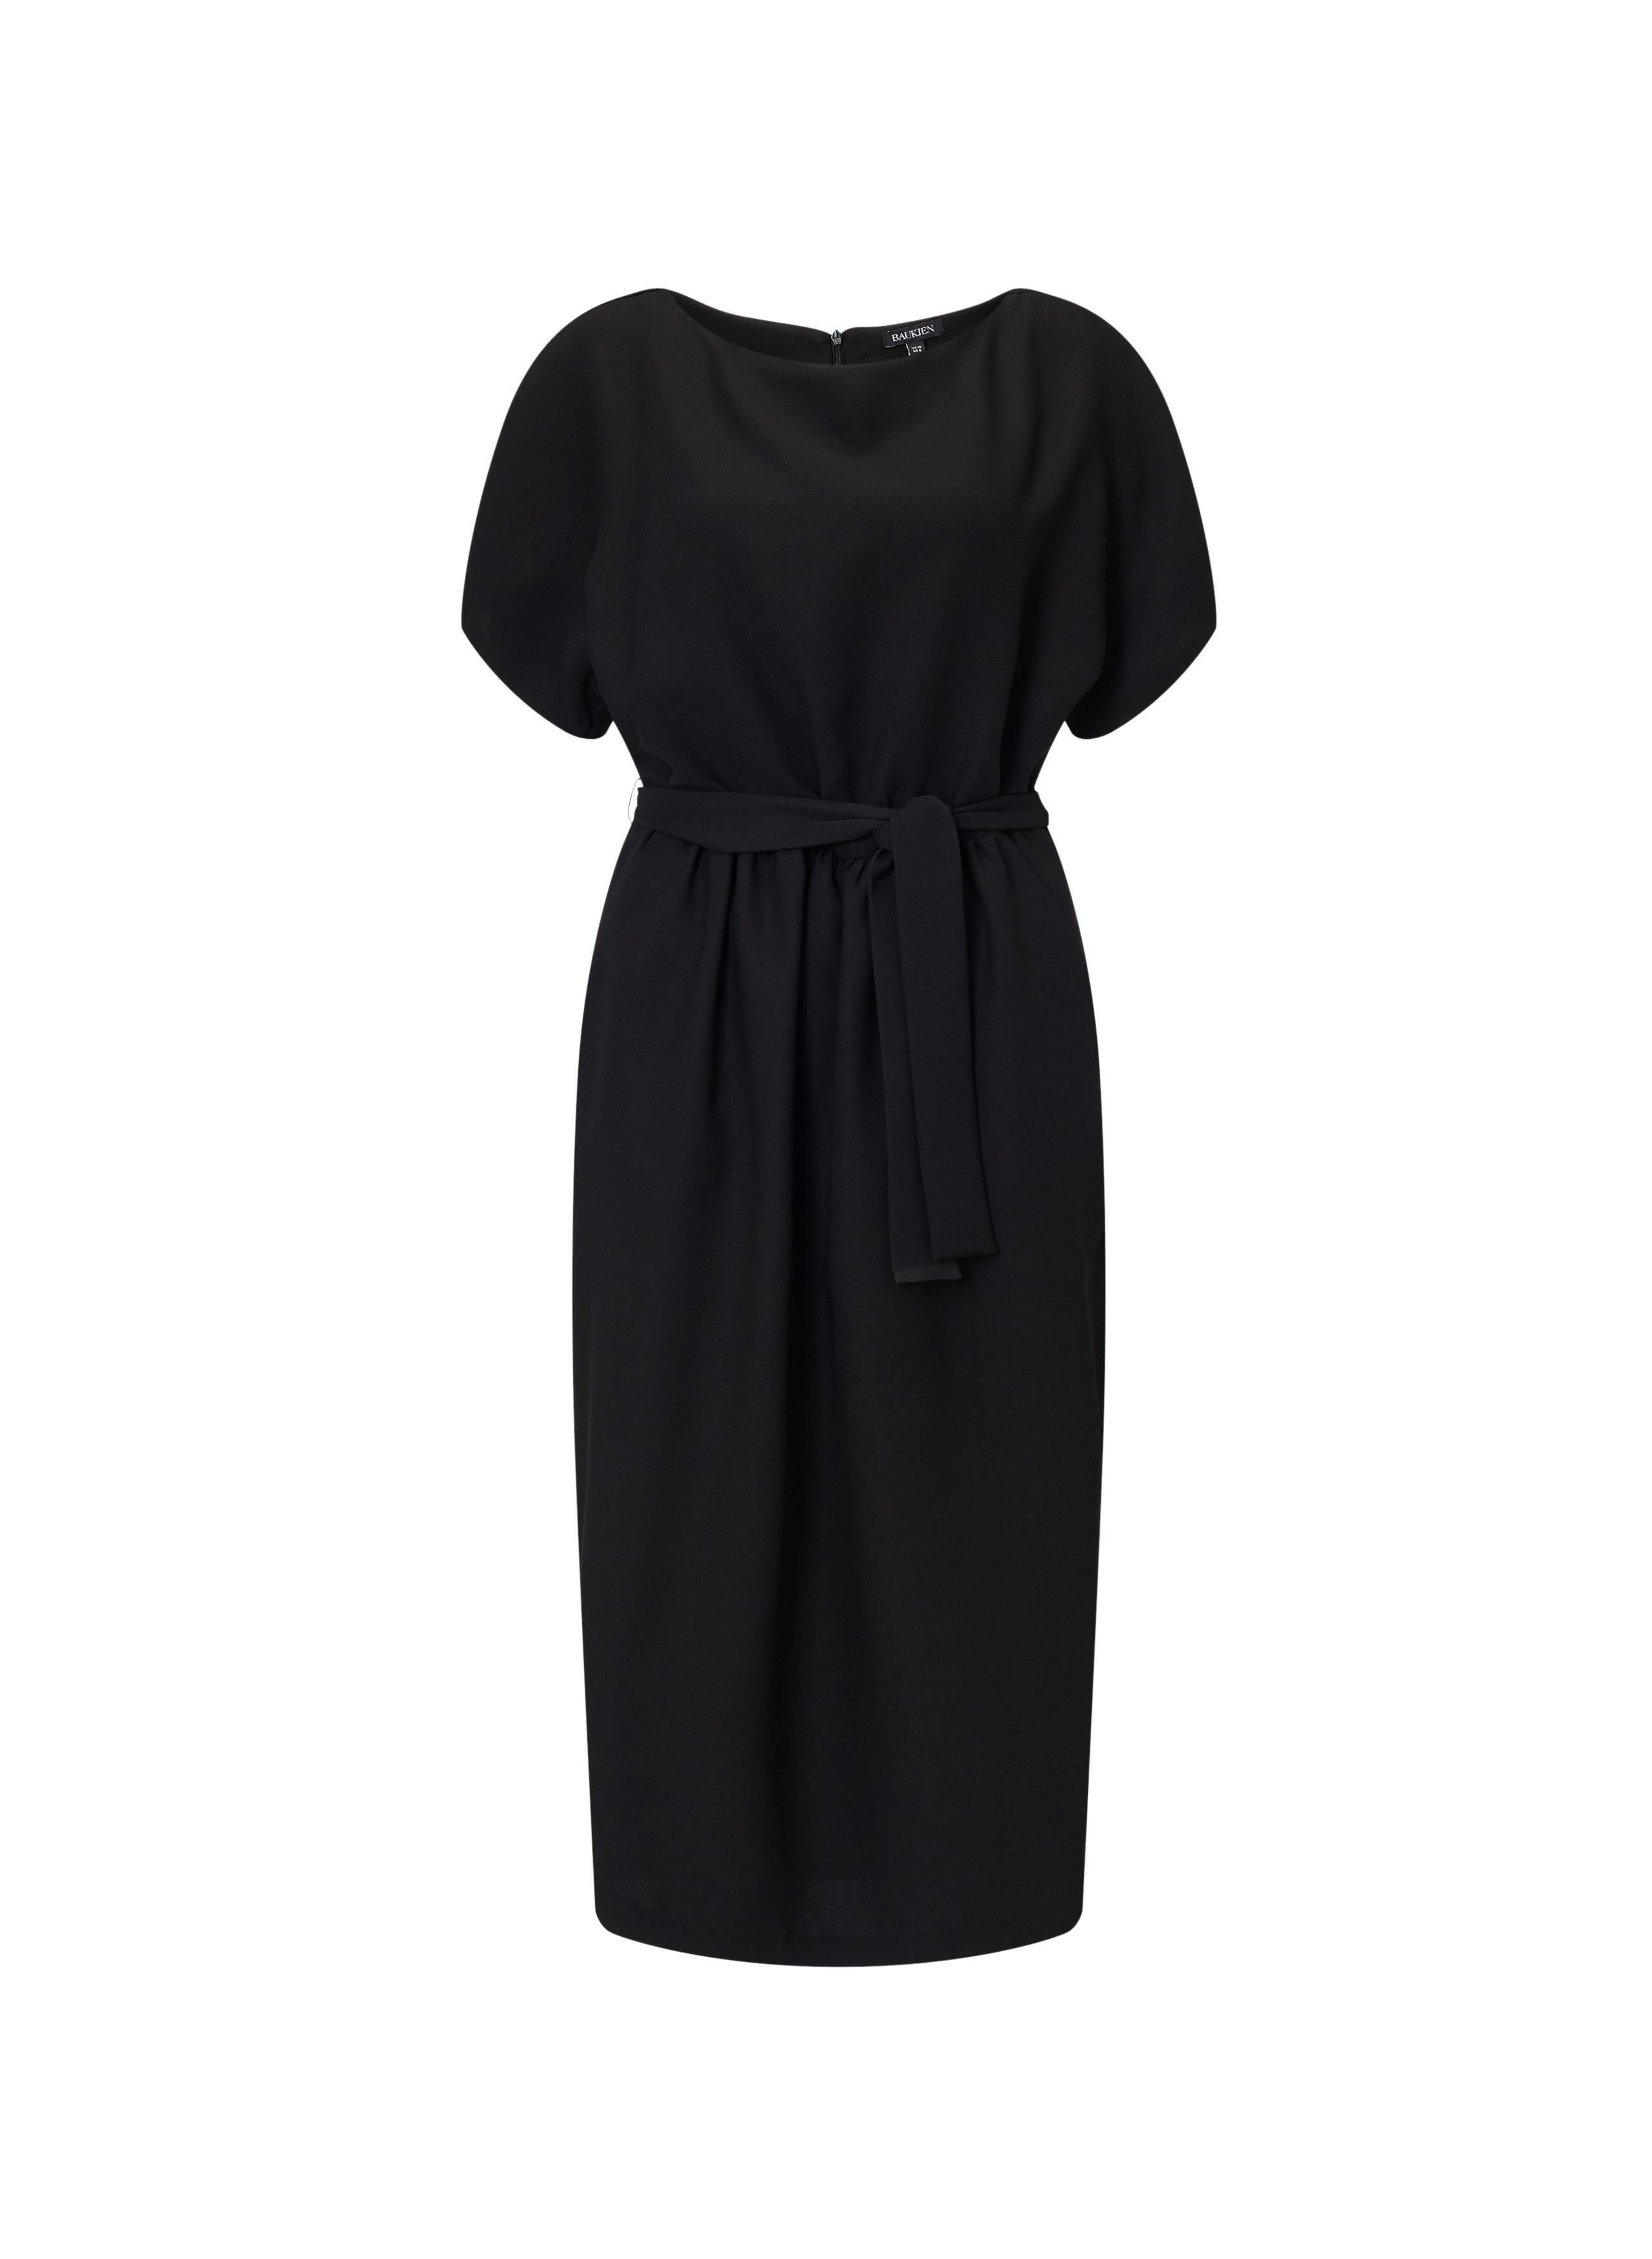 88f941d9878d8 Baukjen Maeve Shift Dress in Black - Lyst